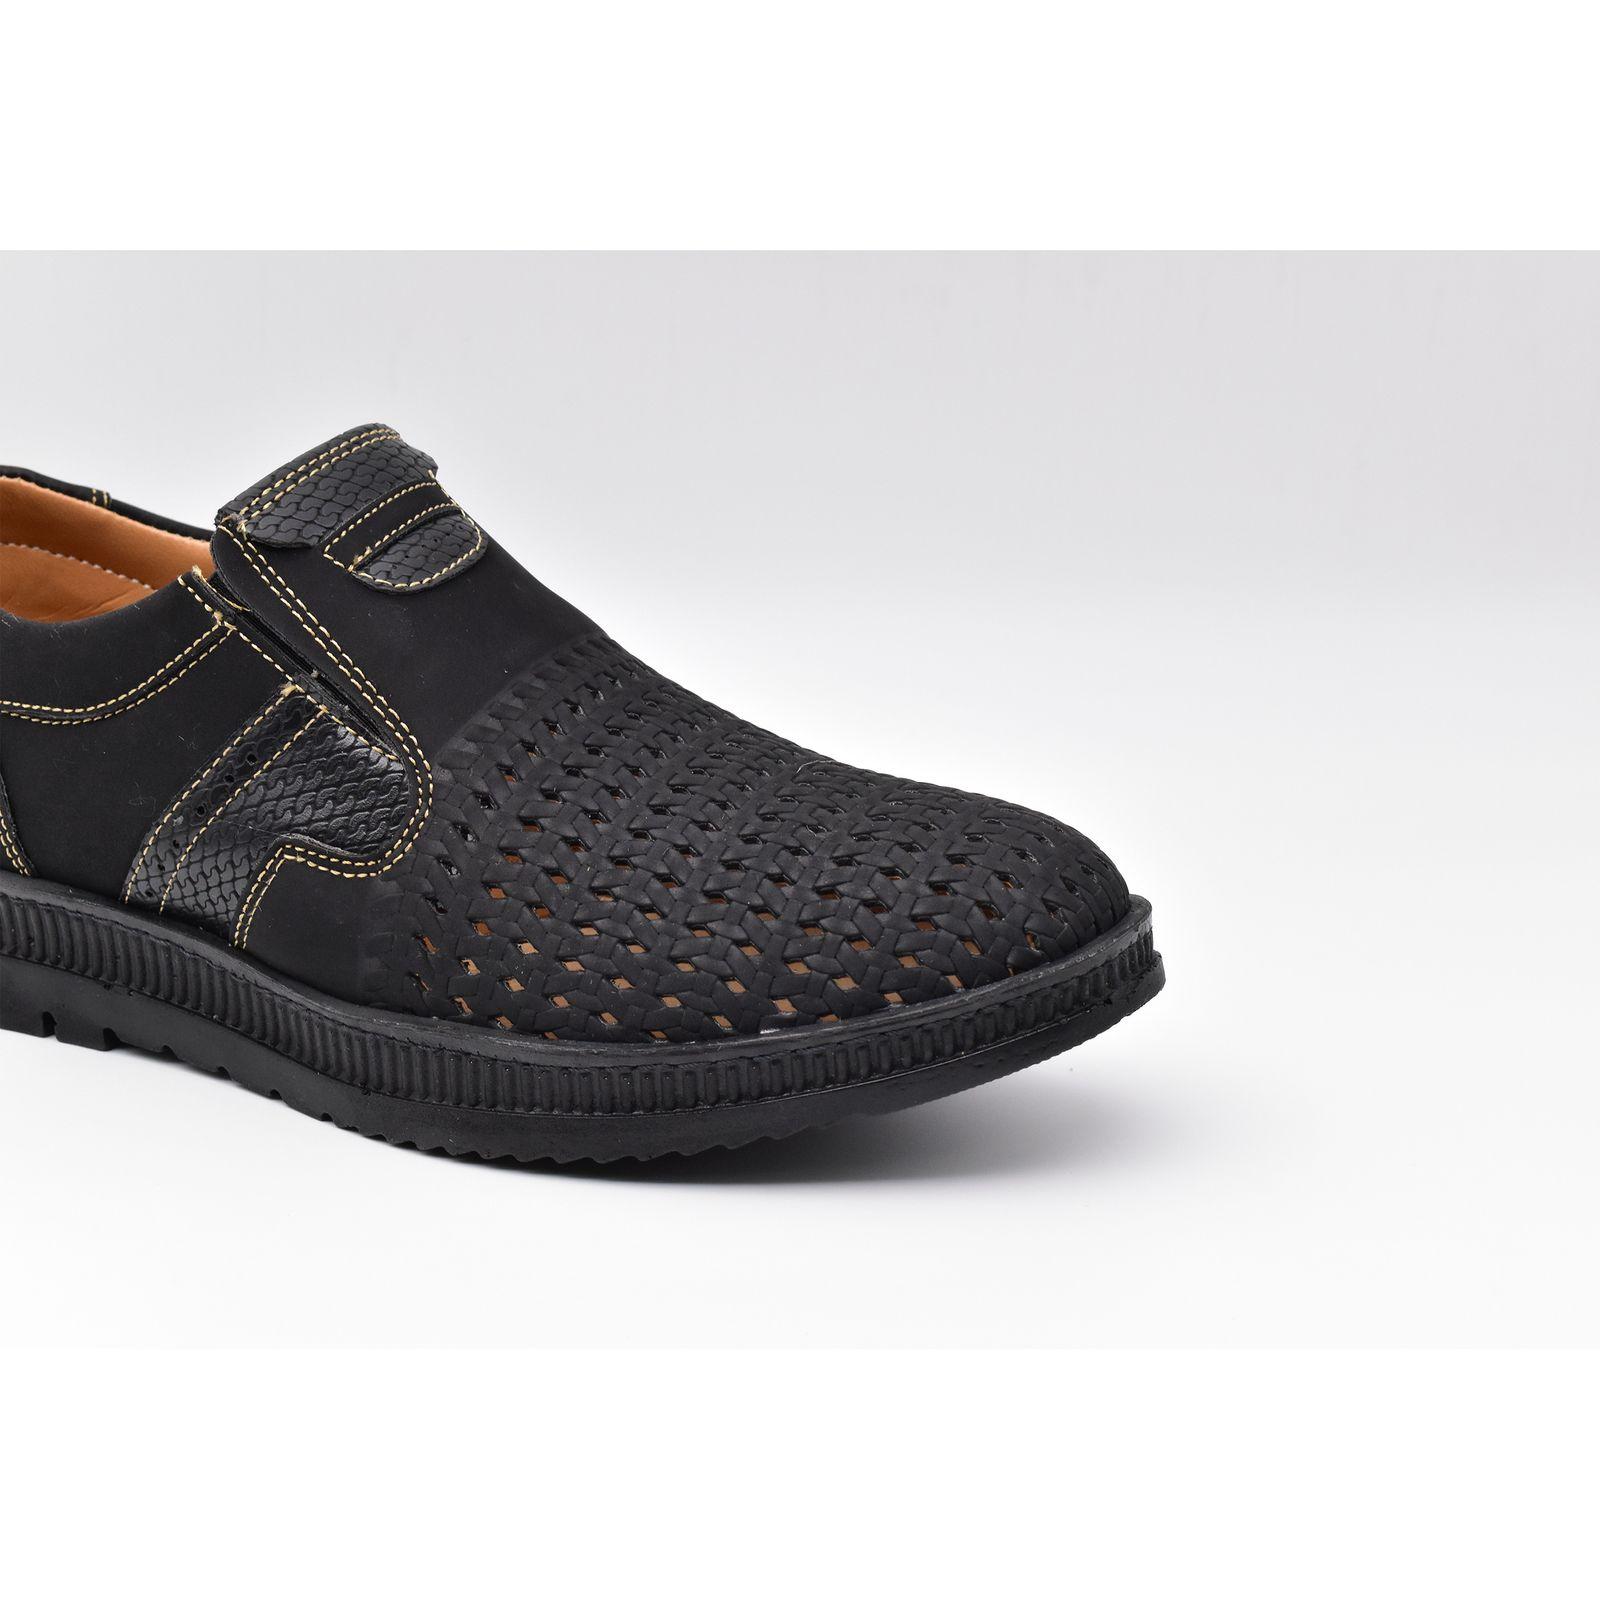 کفش روزمره مردانه مدل گلف کد 7014 -  - 4